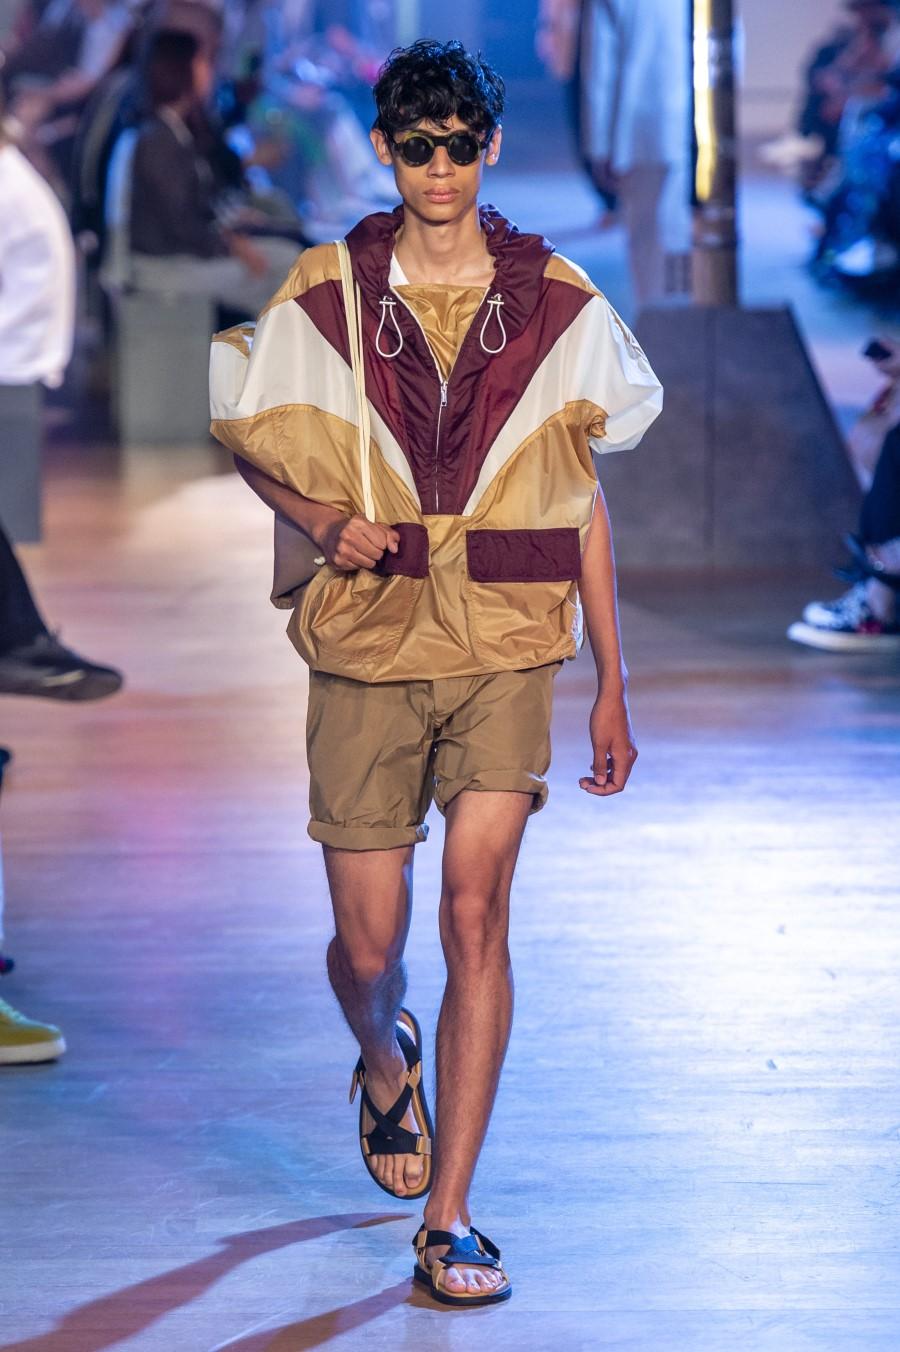 d66d623268 Cerruti 1881 Men's Spring / Summer 2019 - Paris Fashion Week